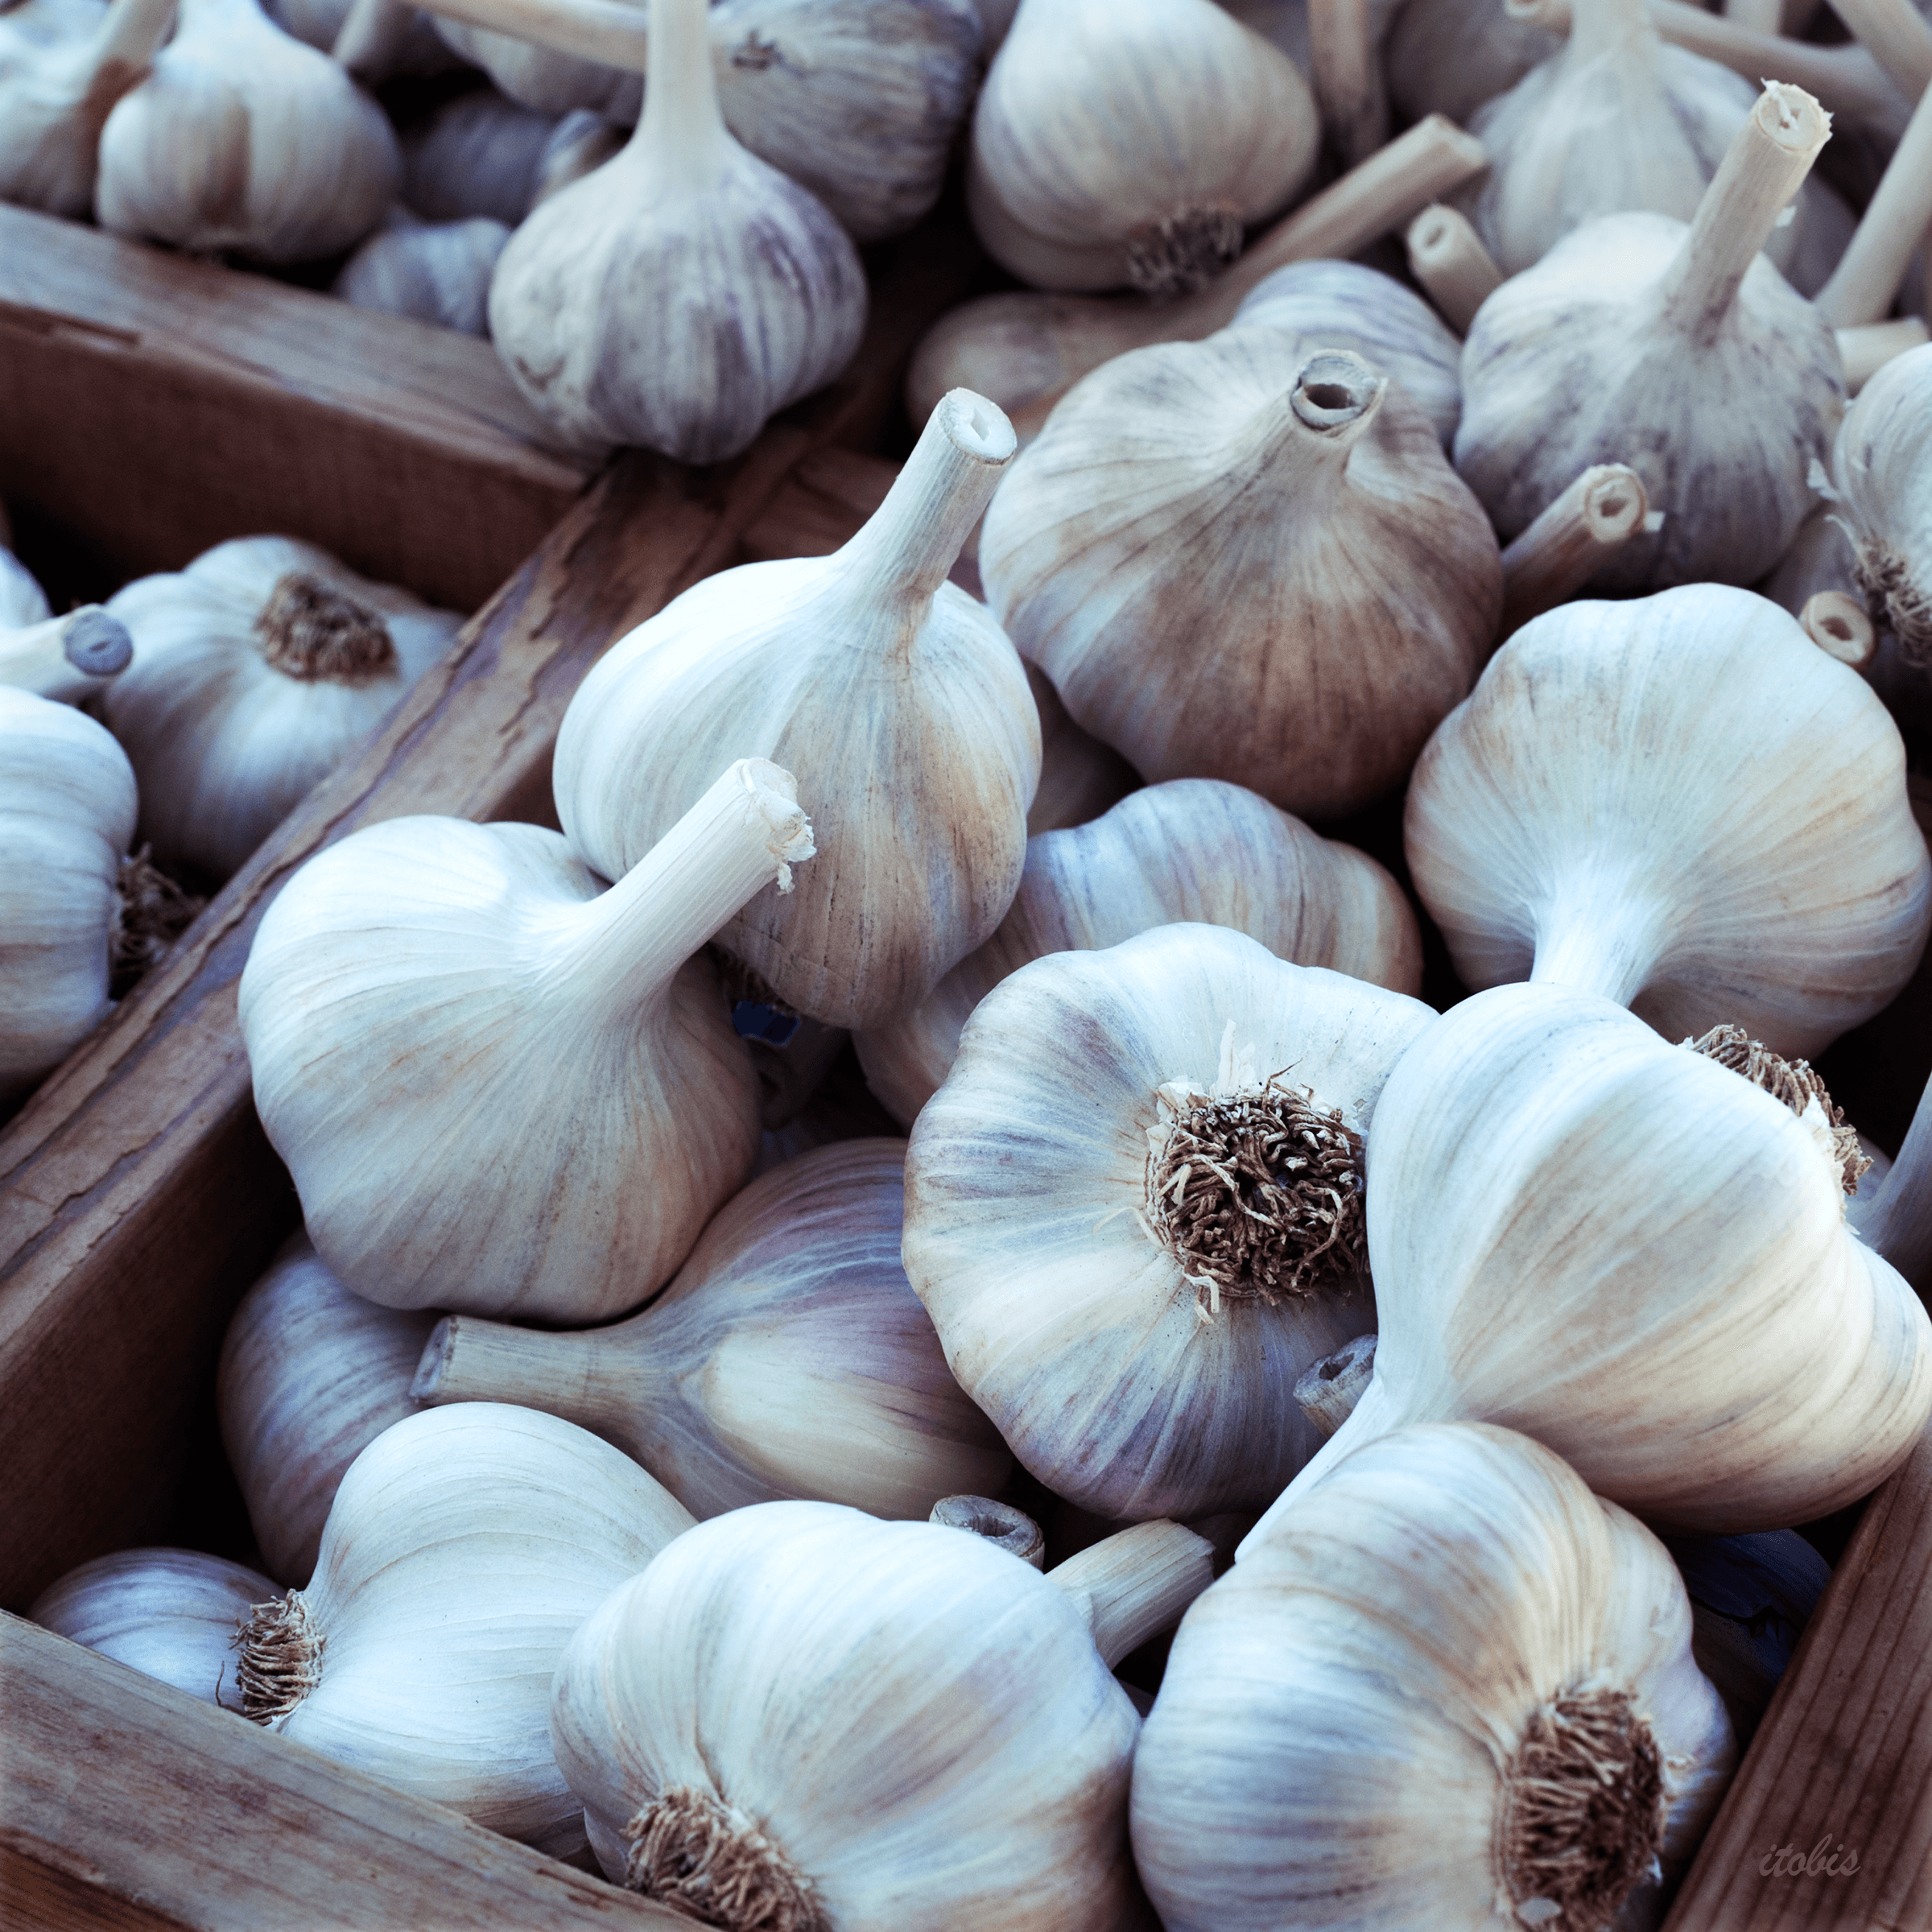 garlic-farmersmarket-VF104-itobis.png